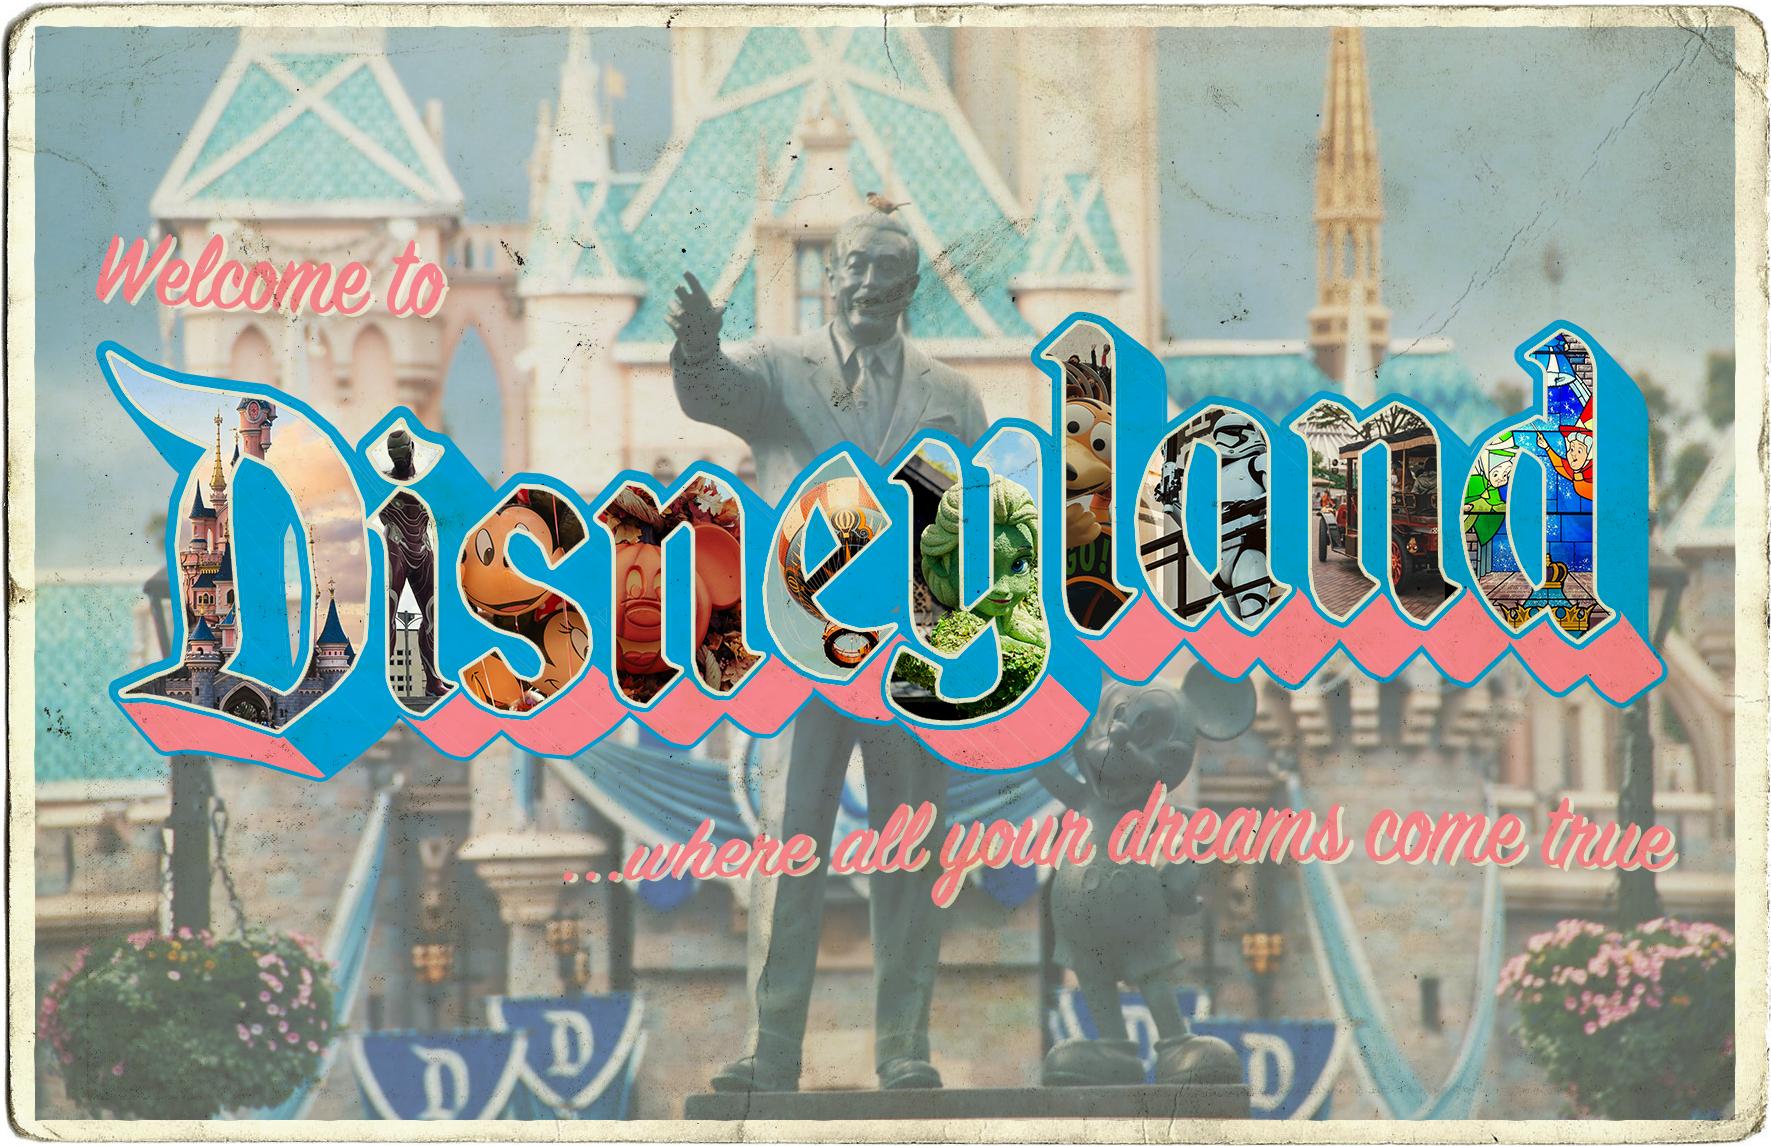 Welcome to Disneyland